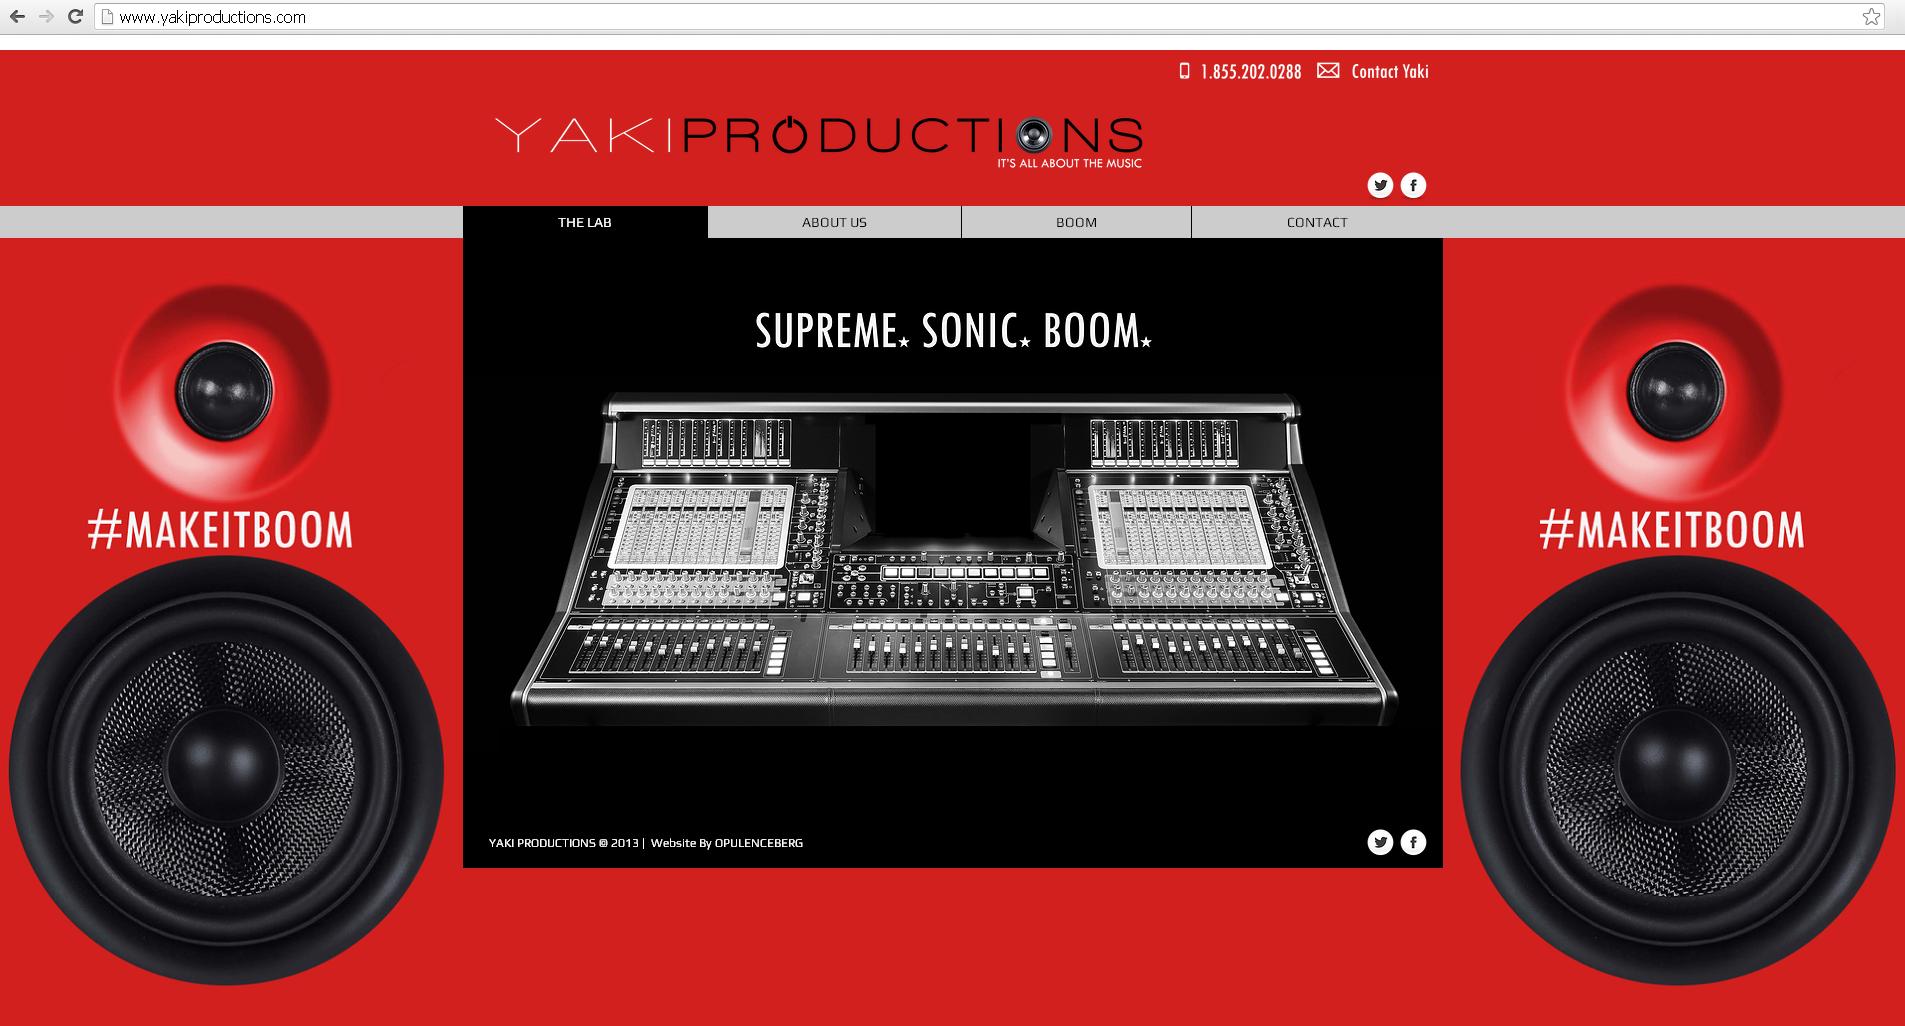 Yaki Productions